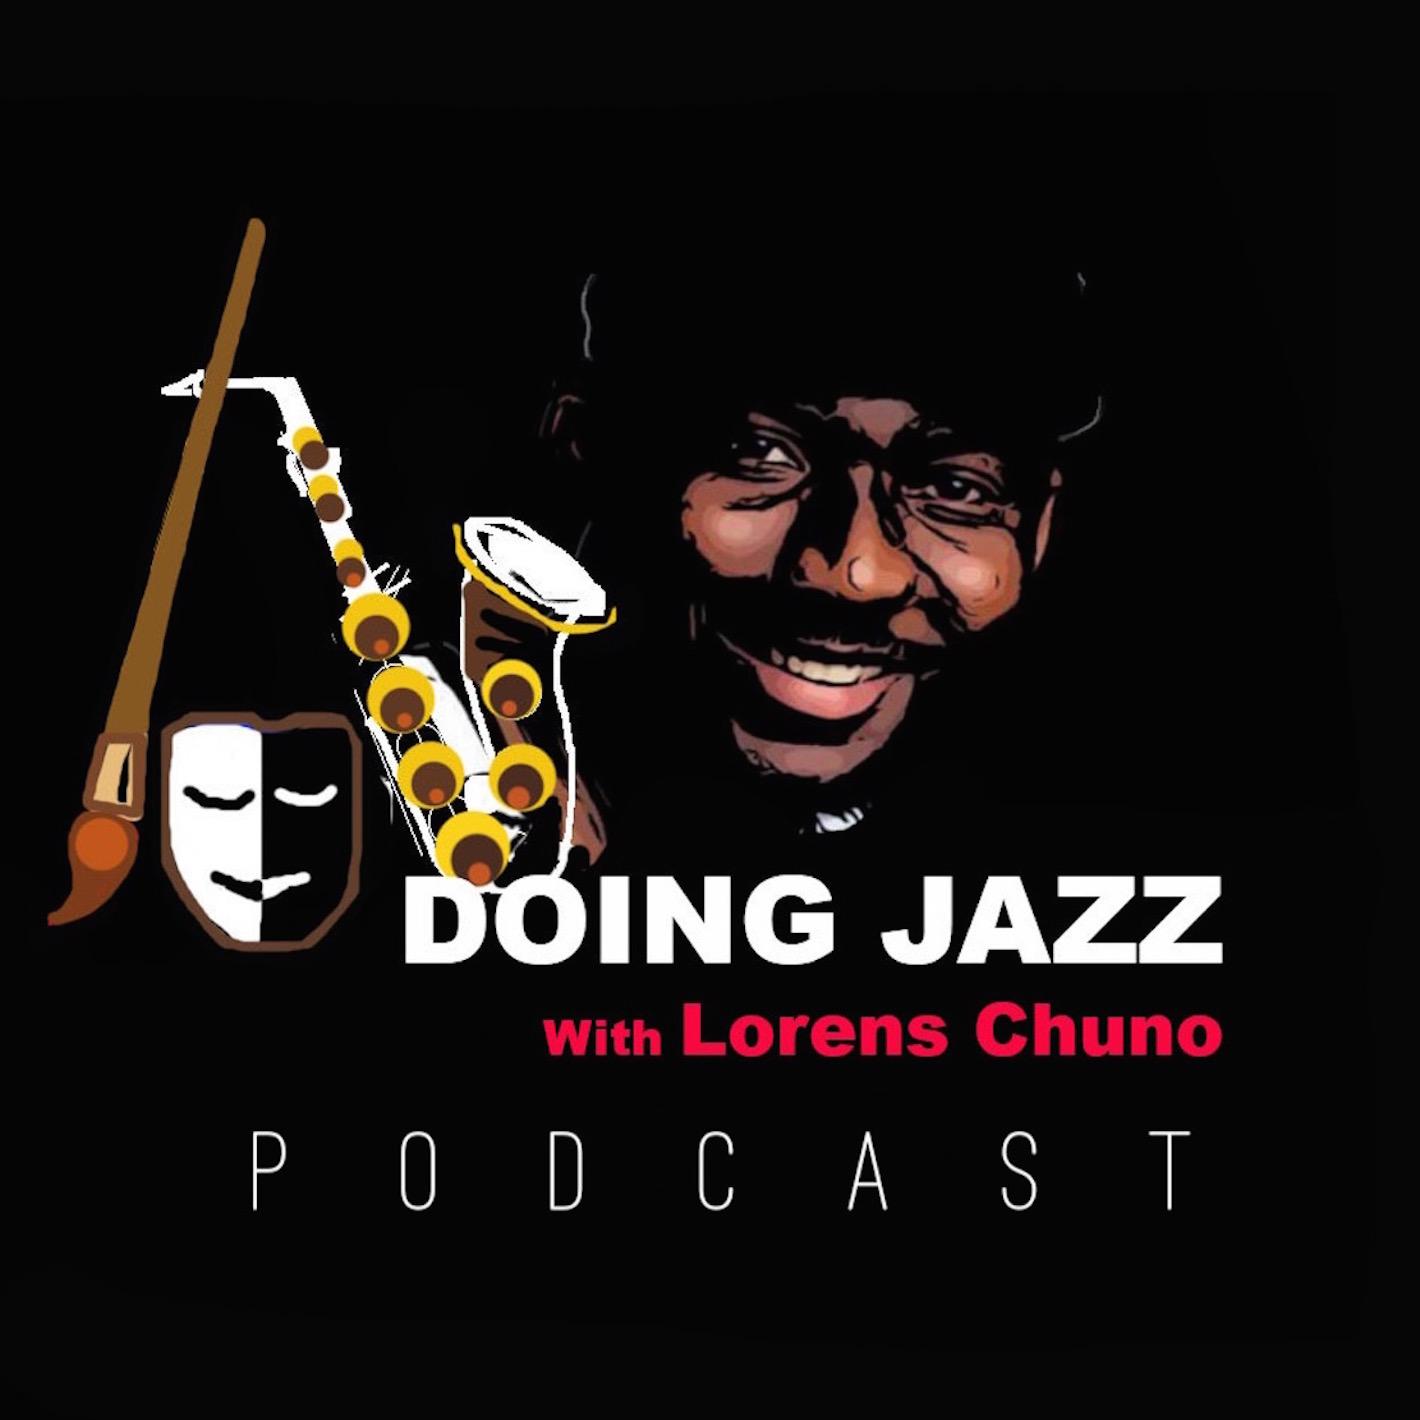 Doing Jazz with Lorens Chuno show art